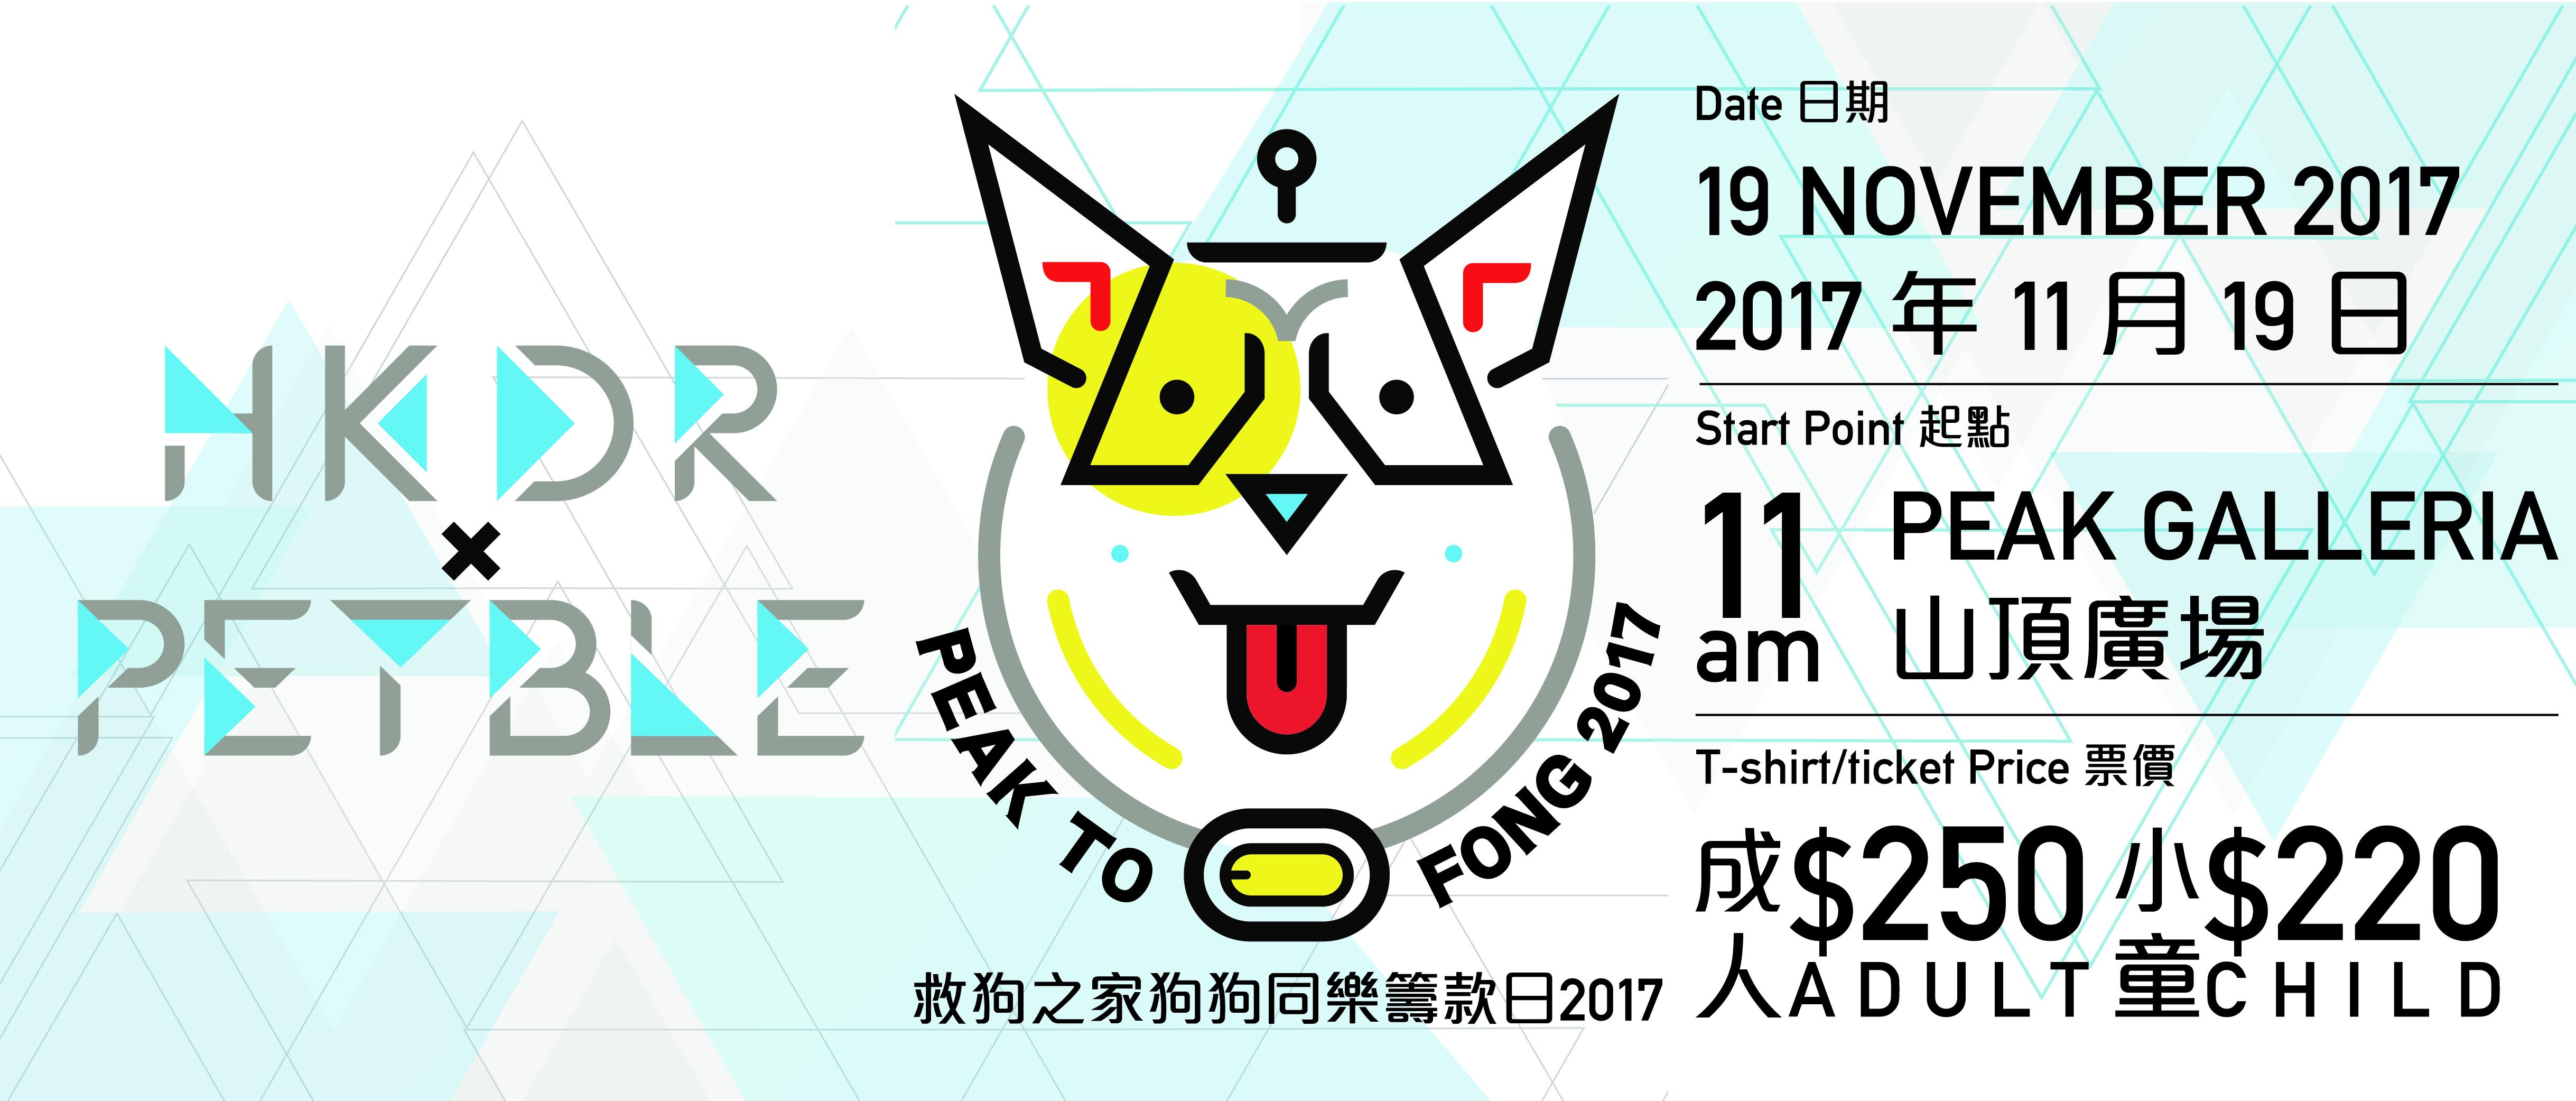 P2F2017_website_banner-01